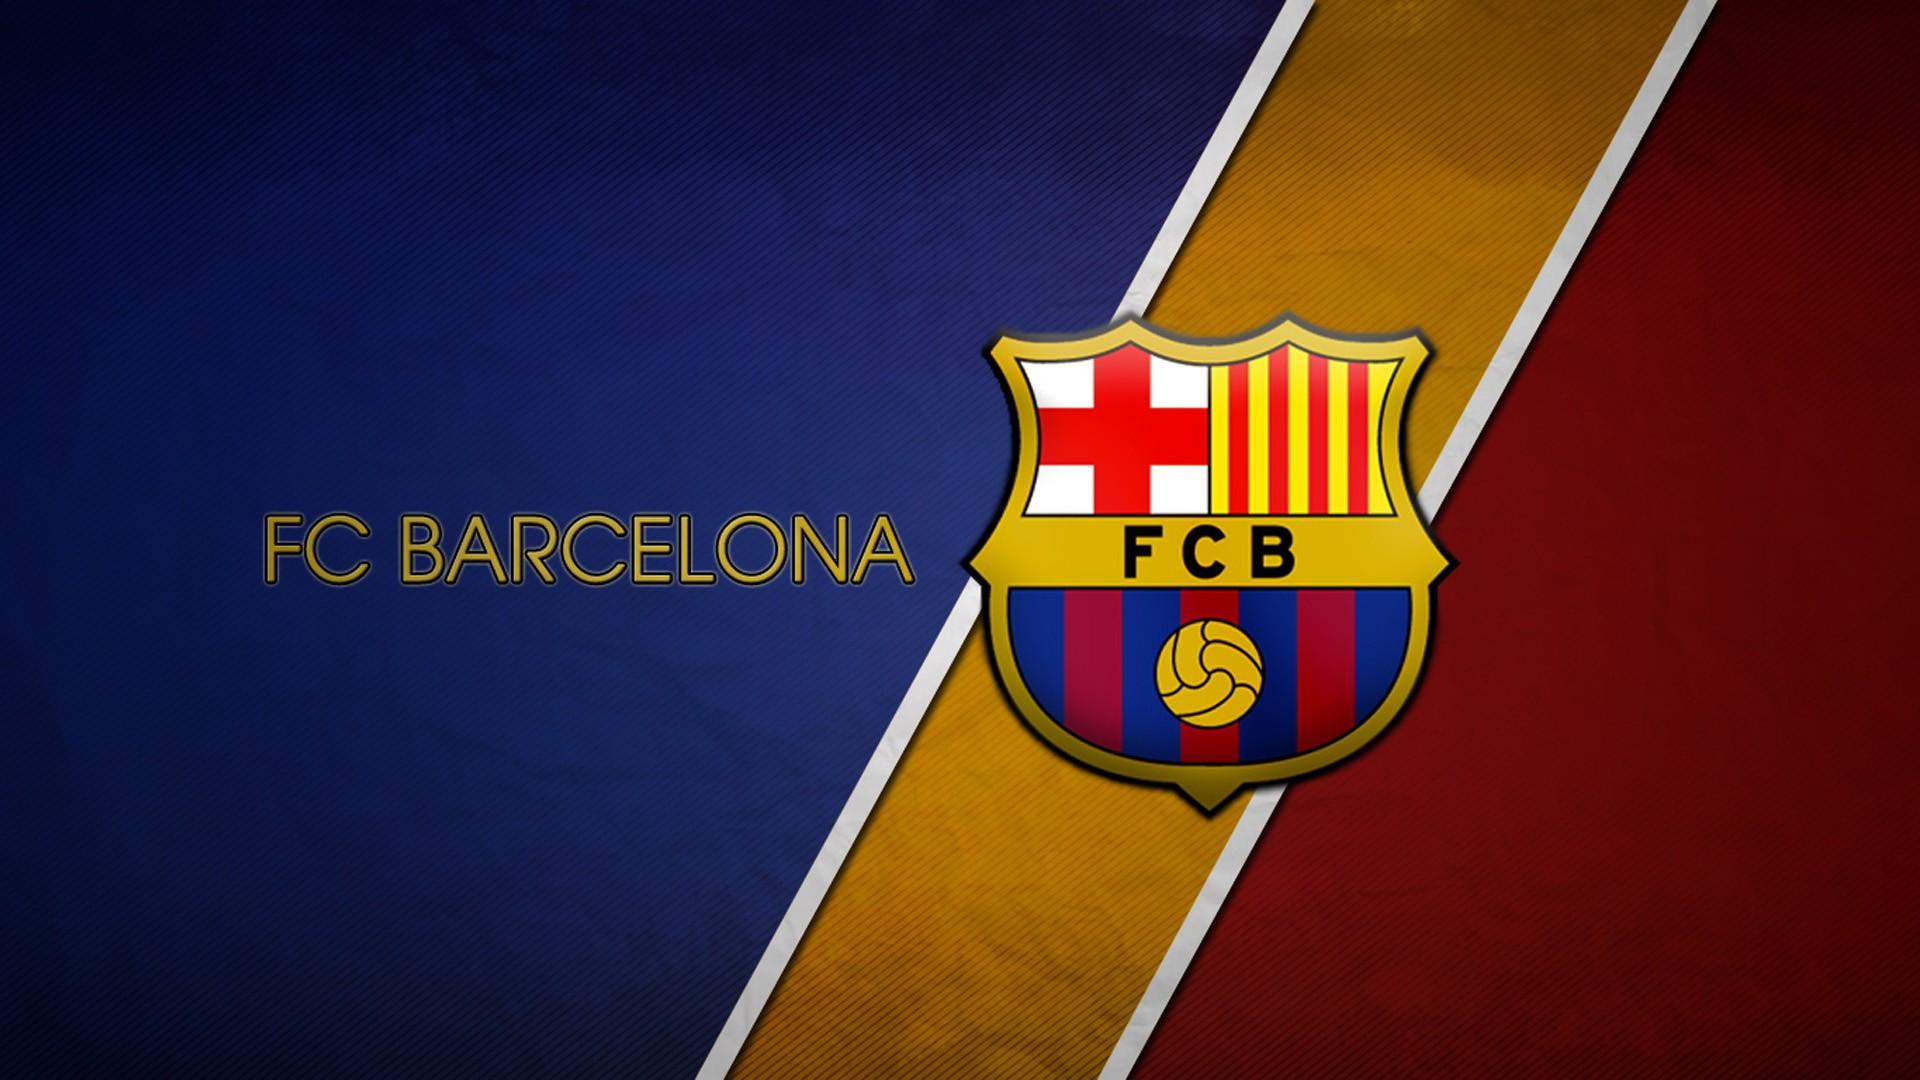 Barcelona Fc Wallpaper 1080p